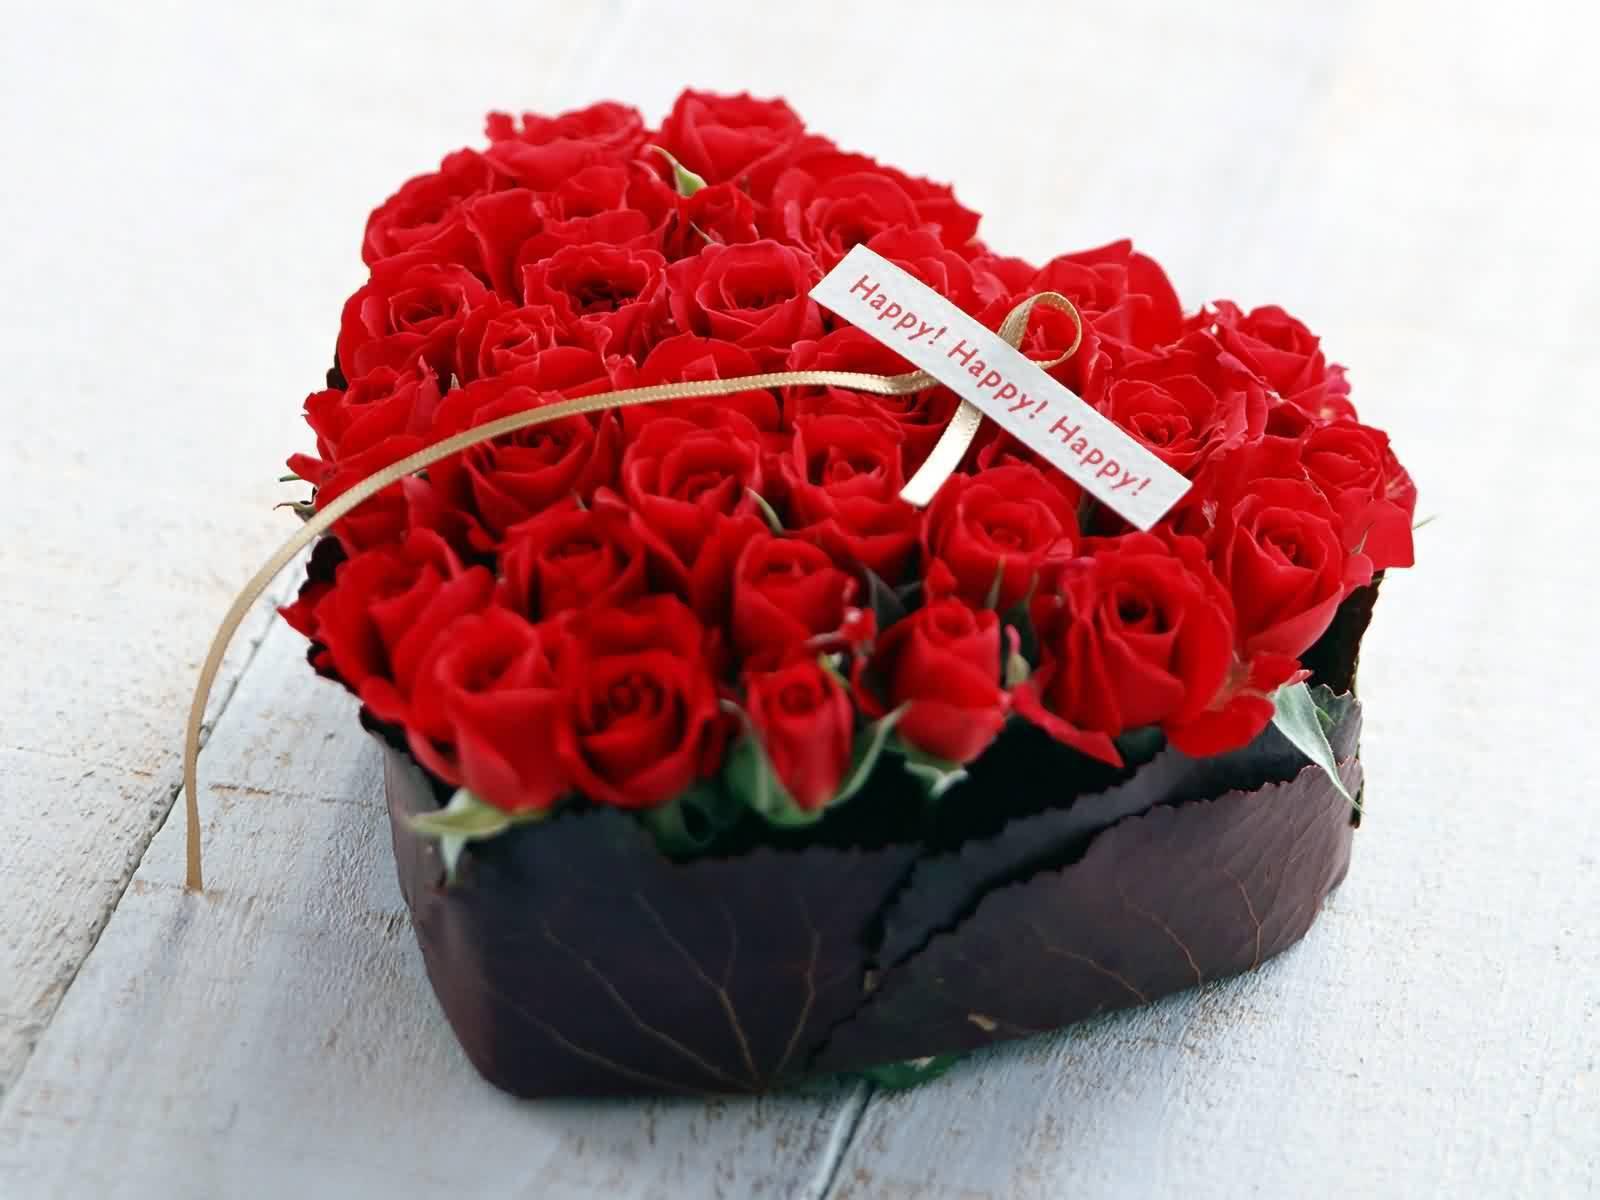 Roses pretty roses